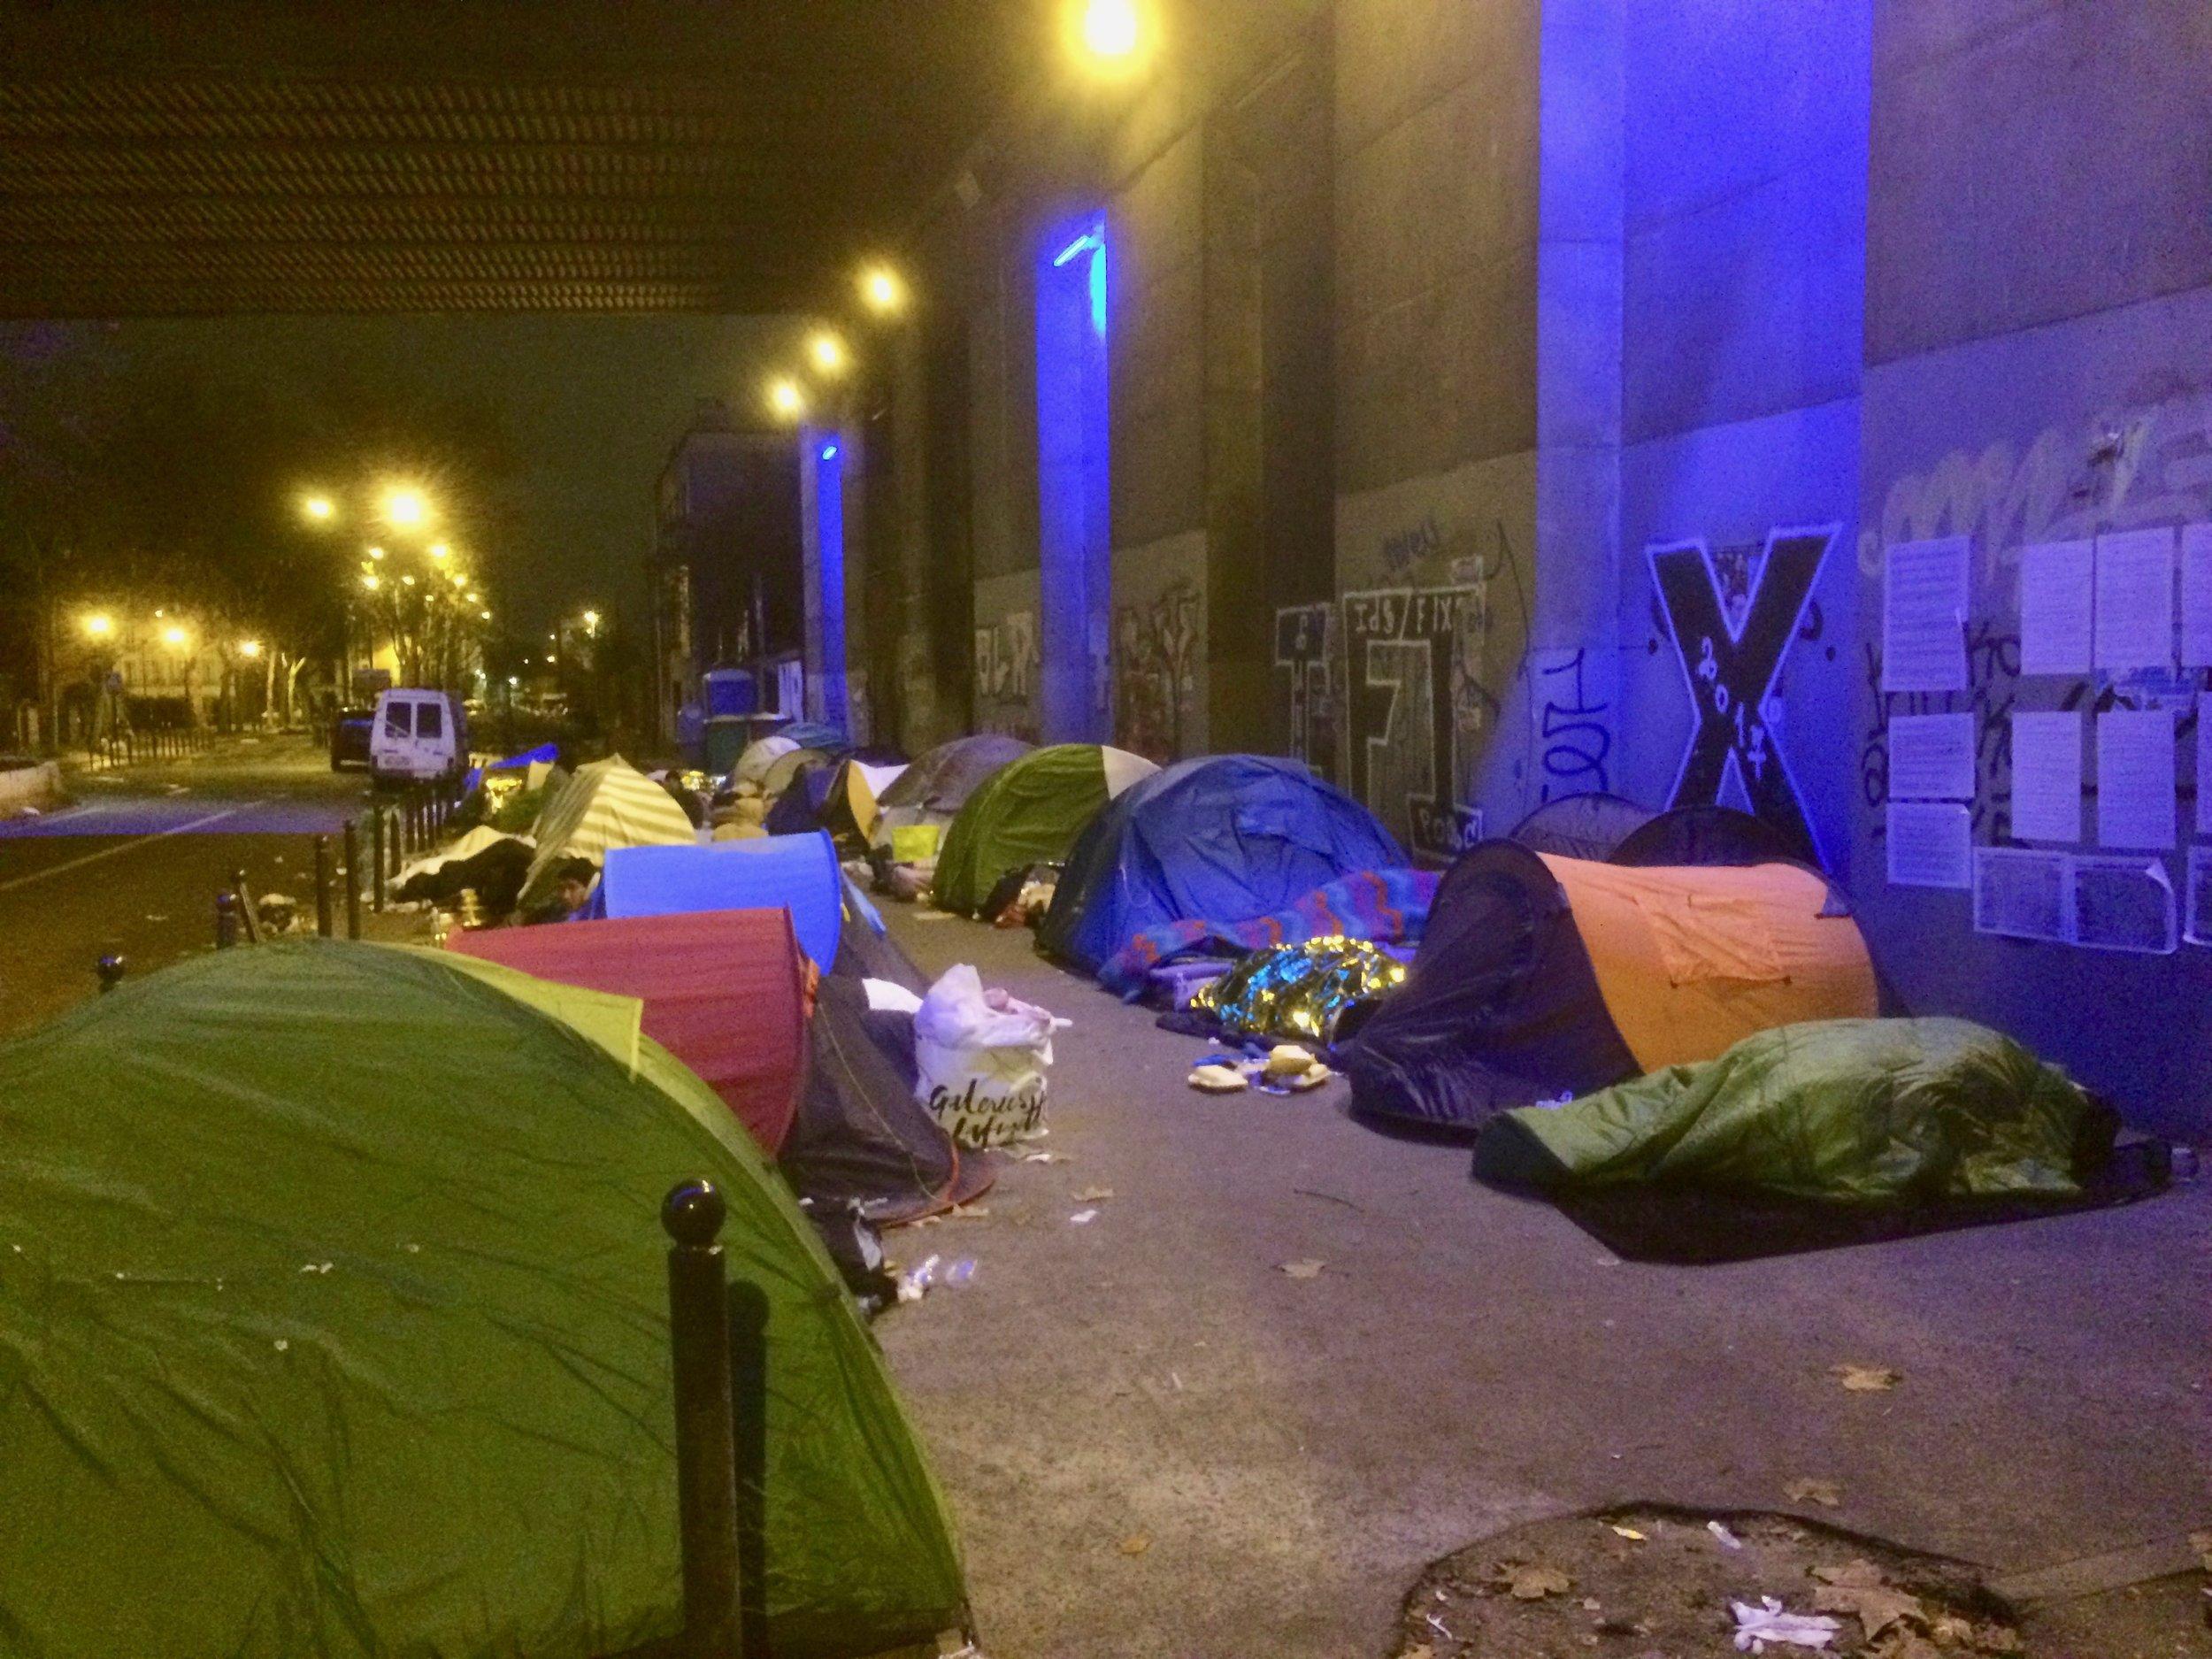 Tents_paris_bridge_december_2017.jpg